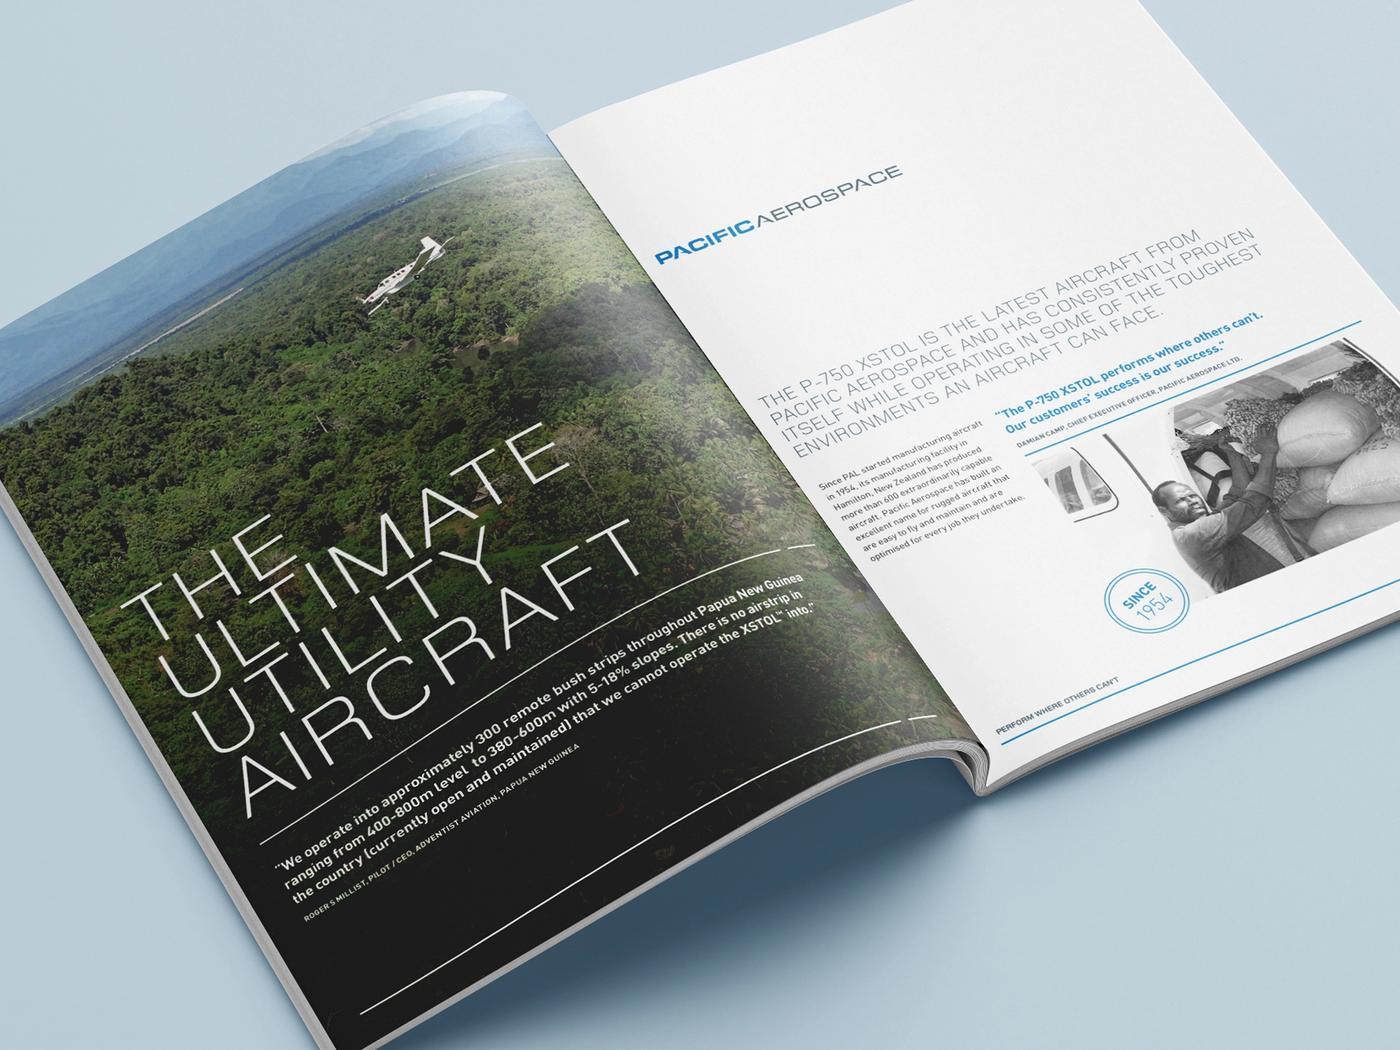 Pacific Aerospace profile document open